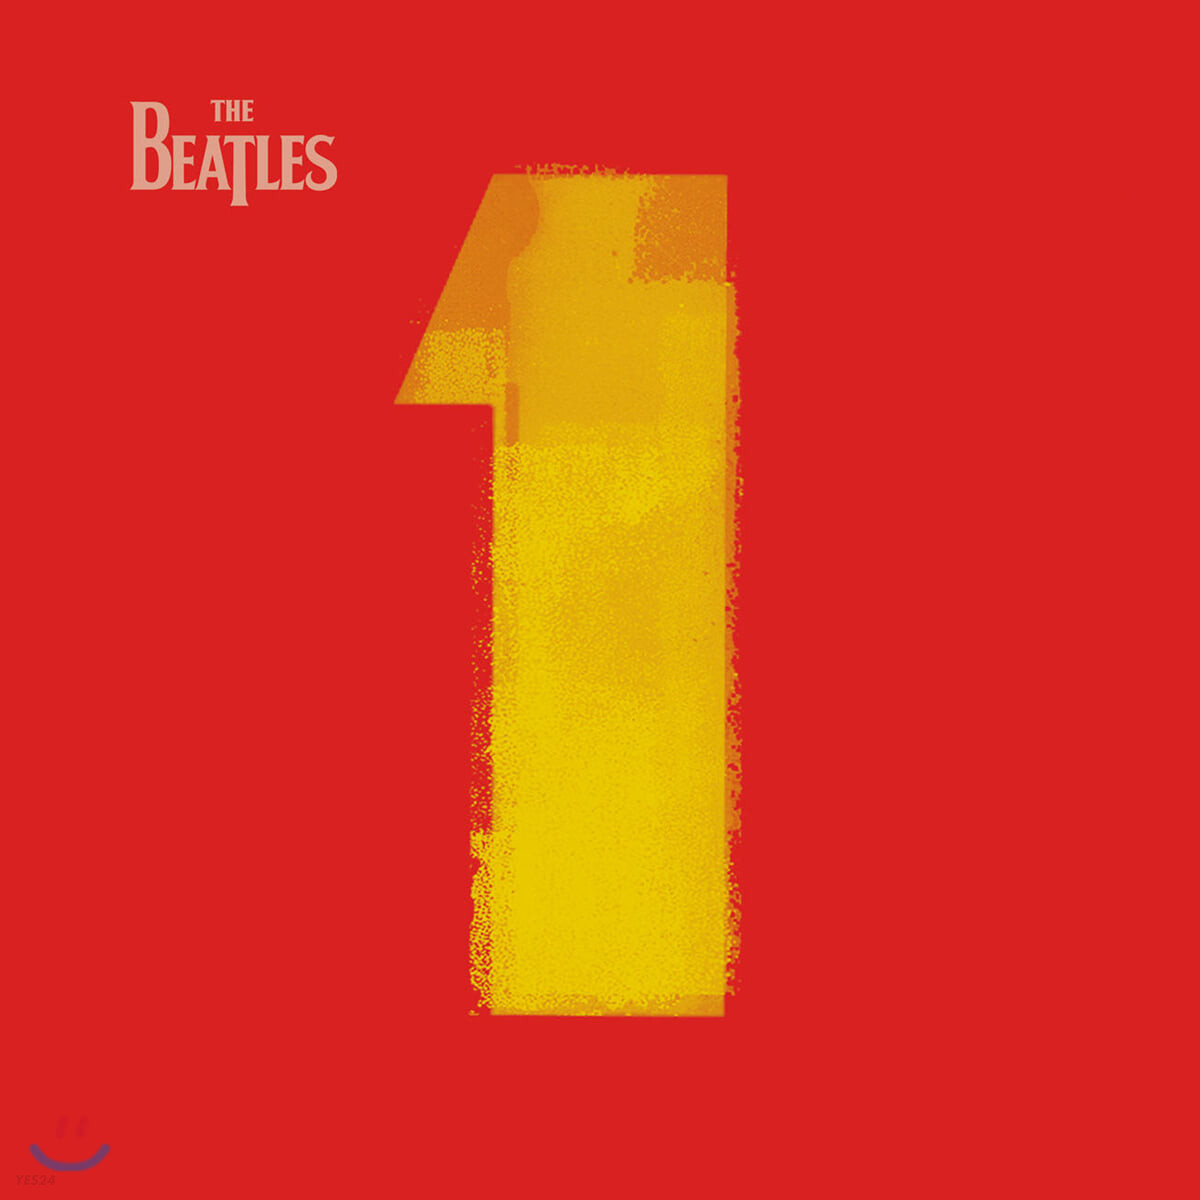 The Beatles (비틀즈) - The Beatles 1 [2LP]